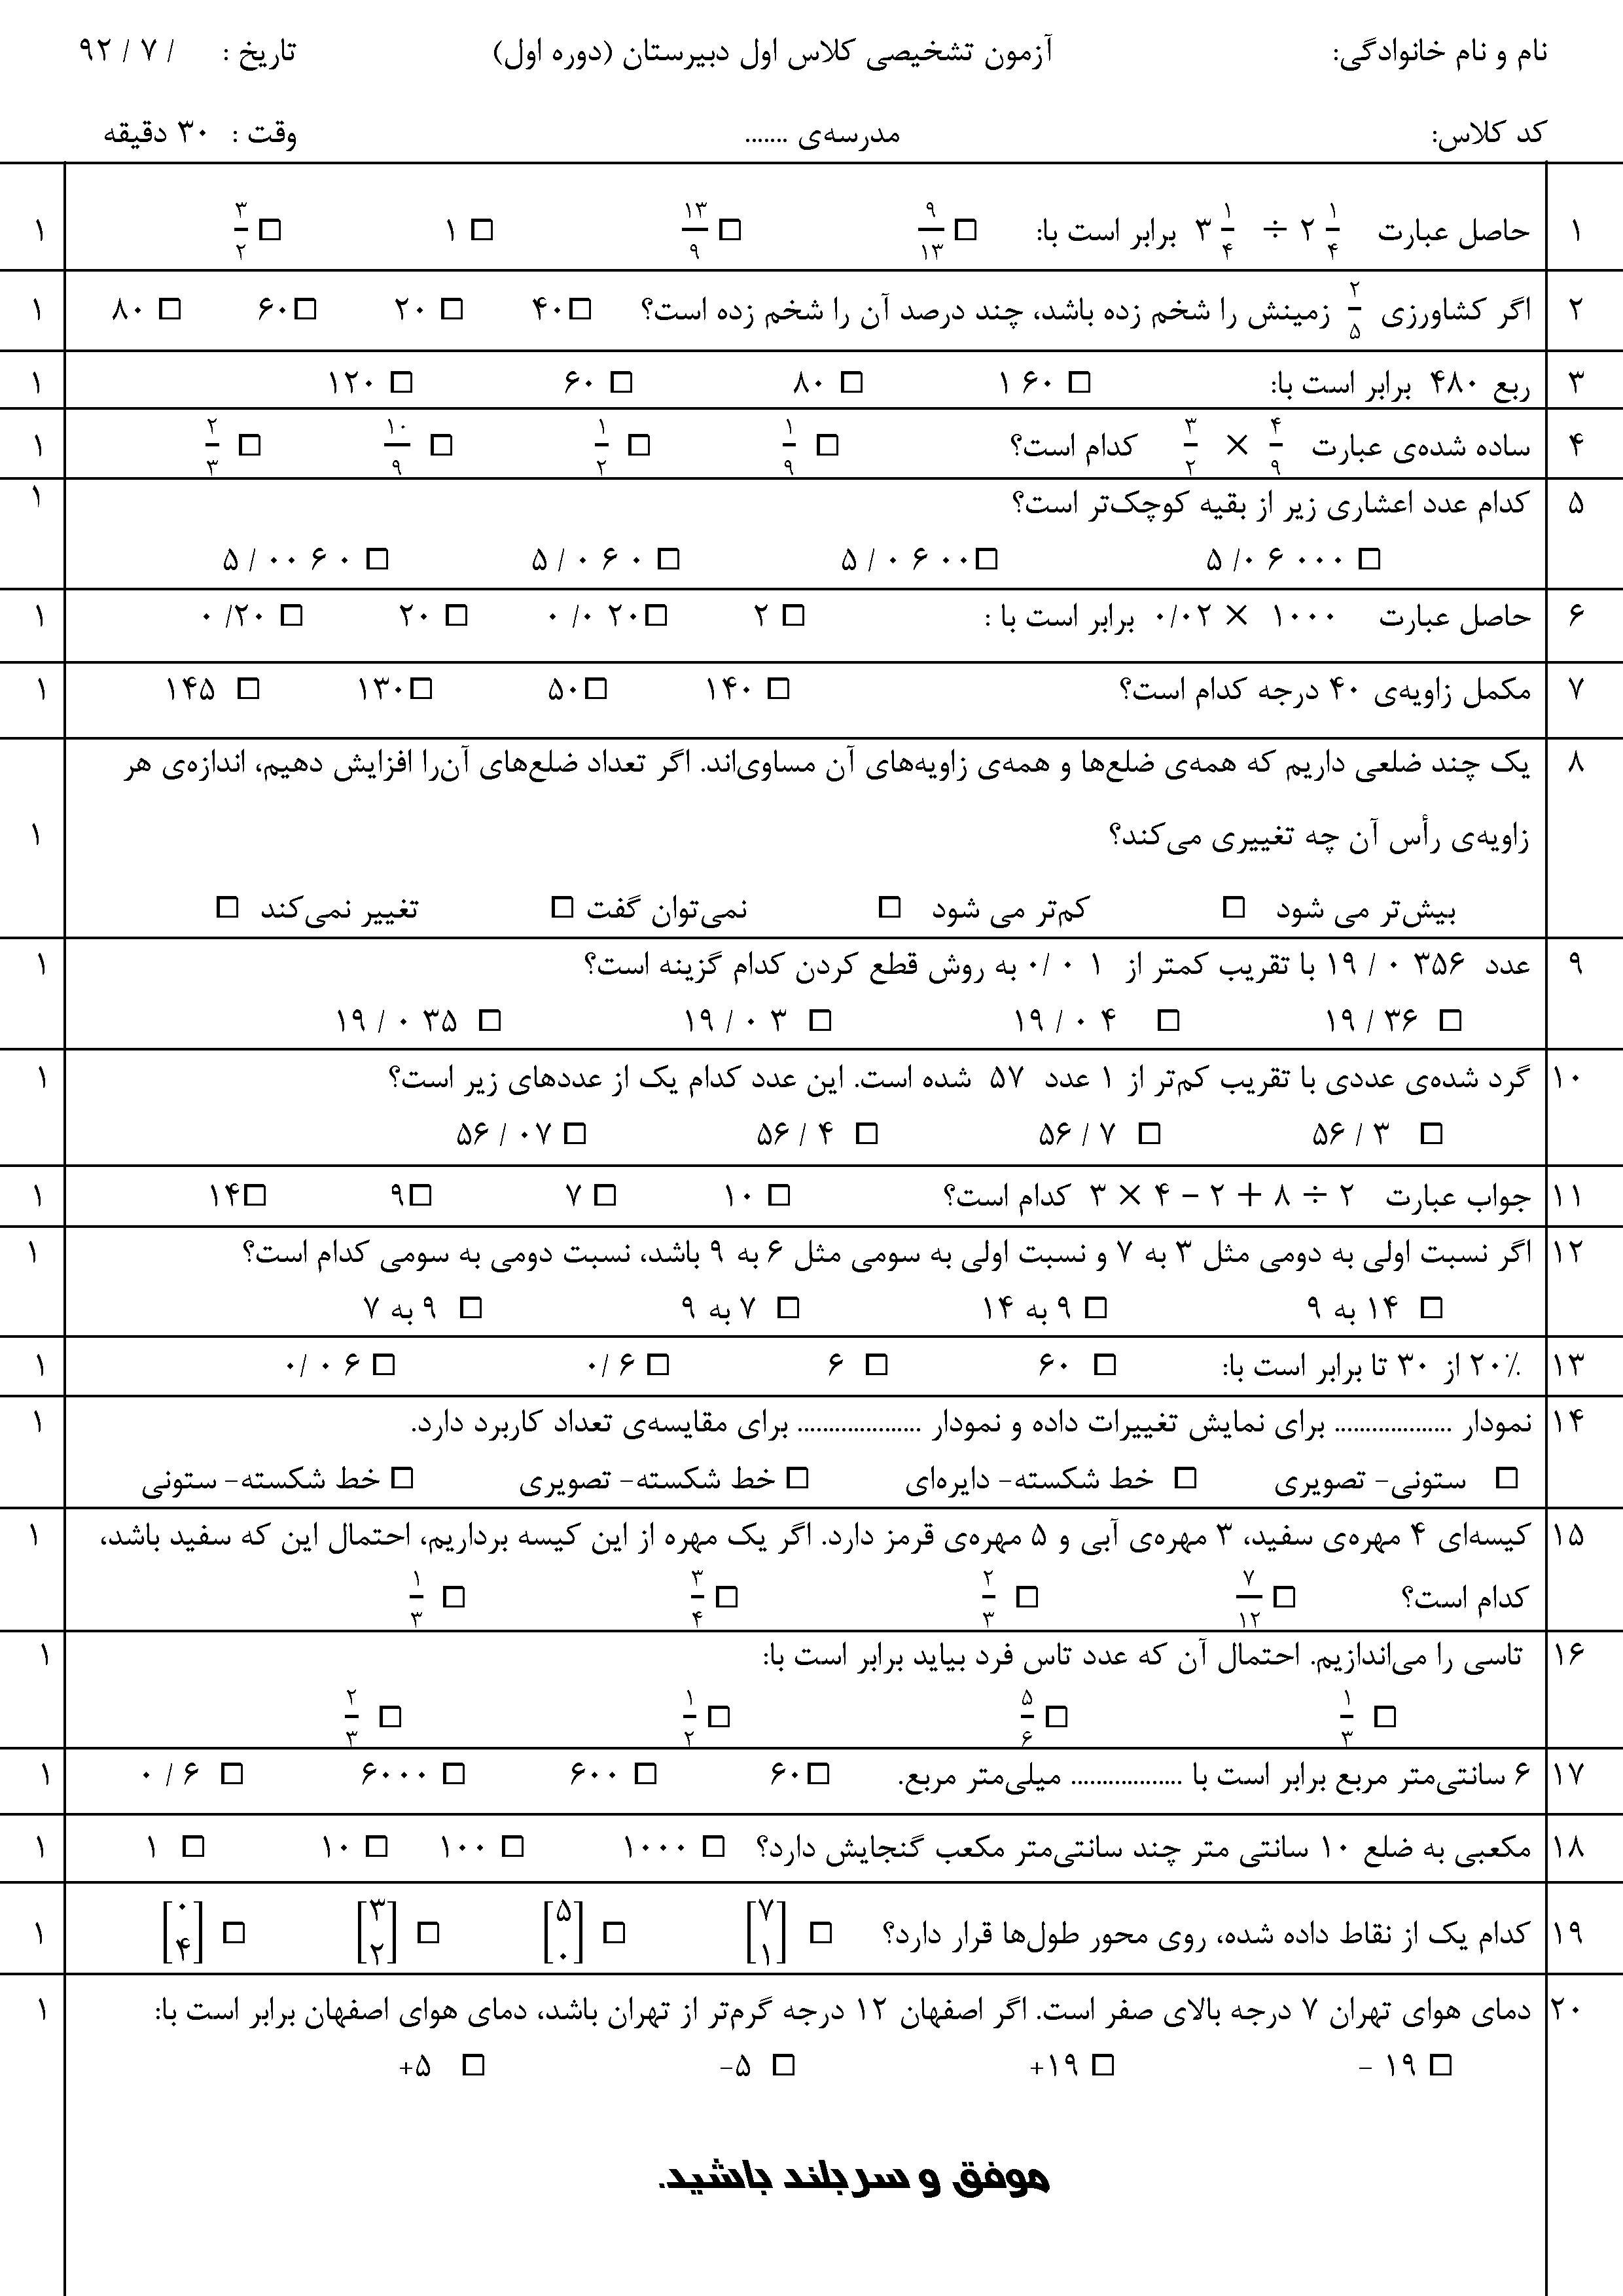 Image result for سوال ریاضی هفتم